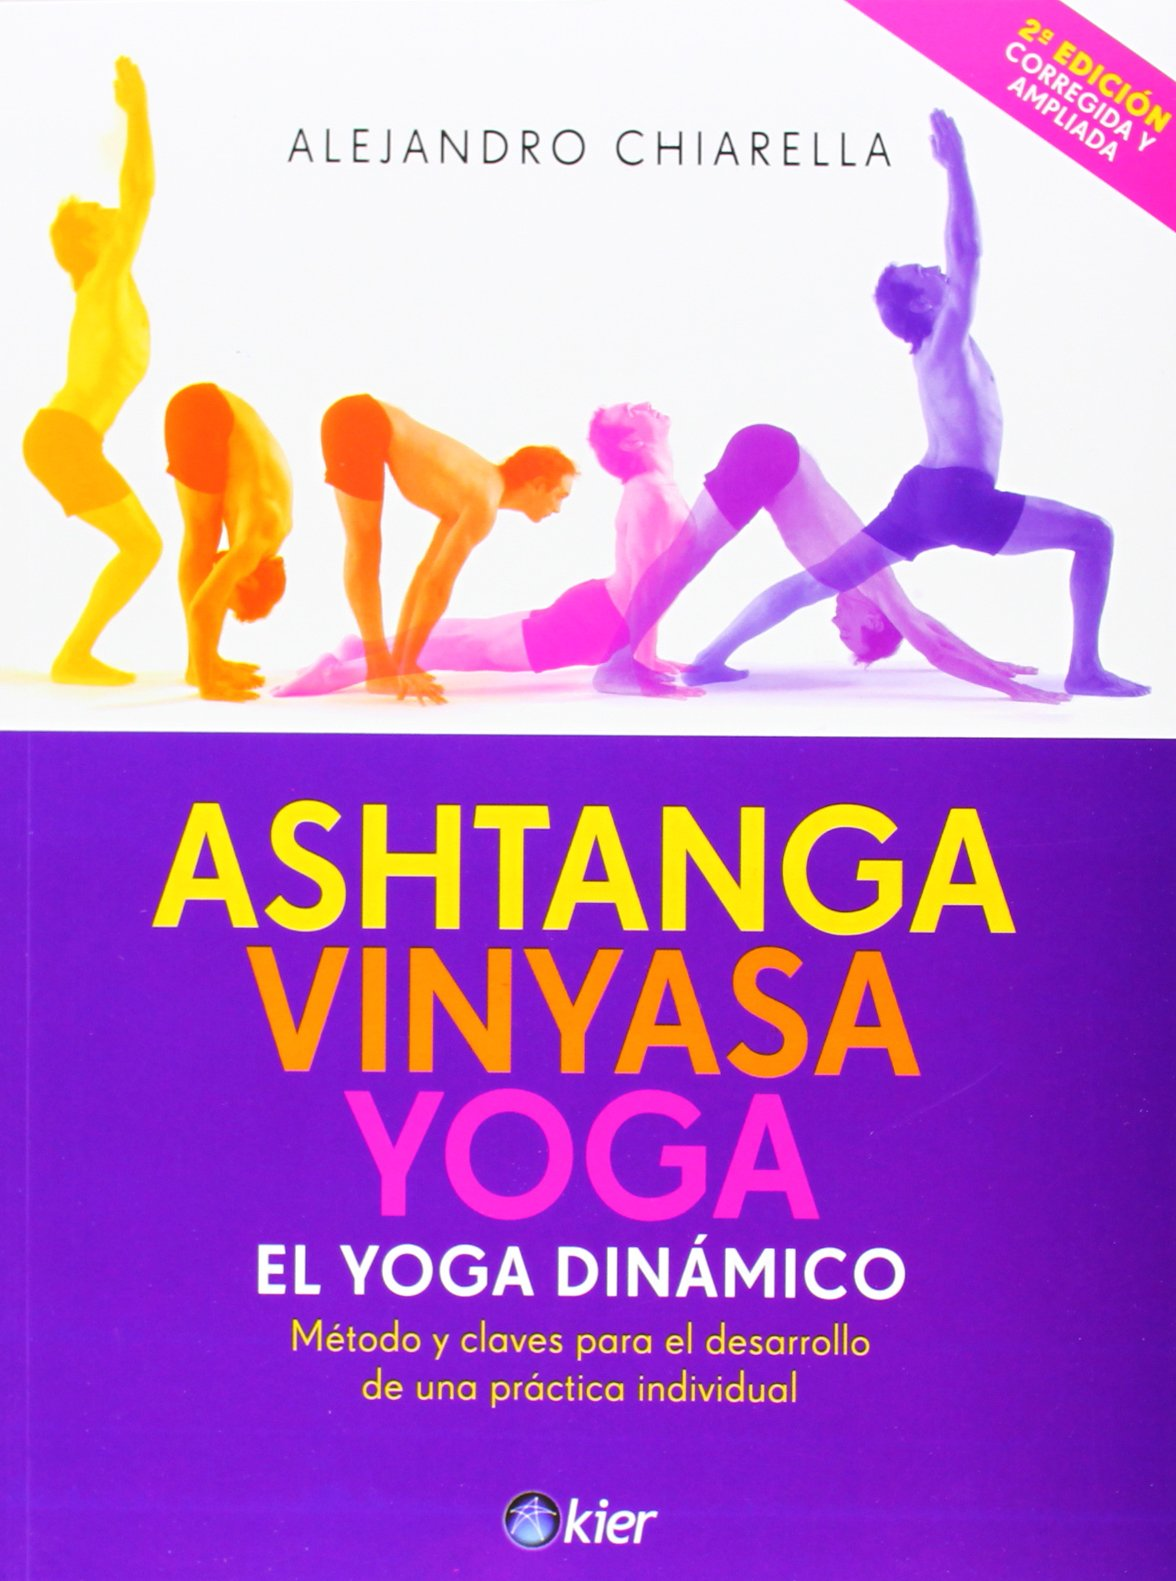 Ashtanga Vinyasa Yoga El Yoga Dinámico [Paperback] [Jan 01 ...